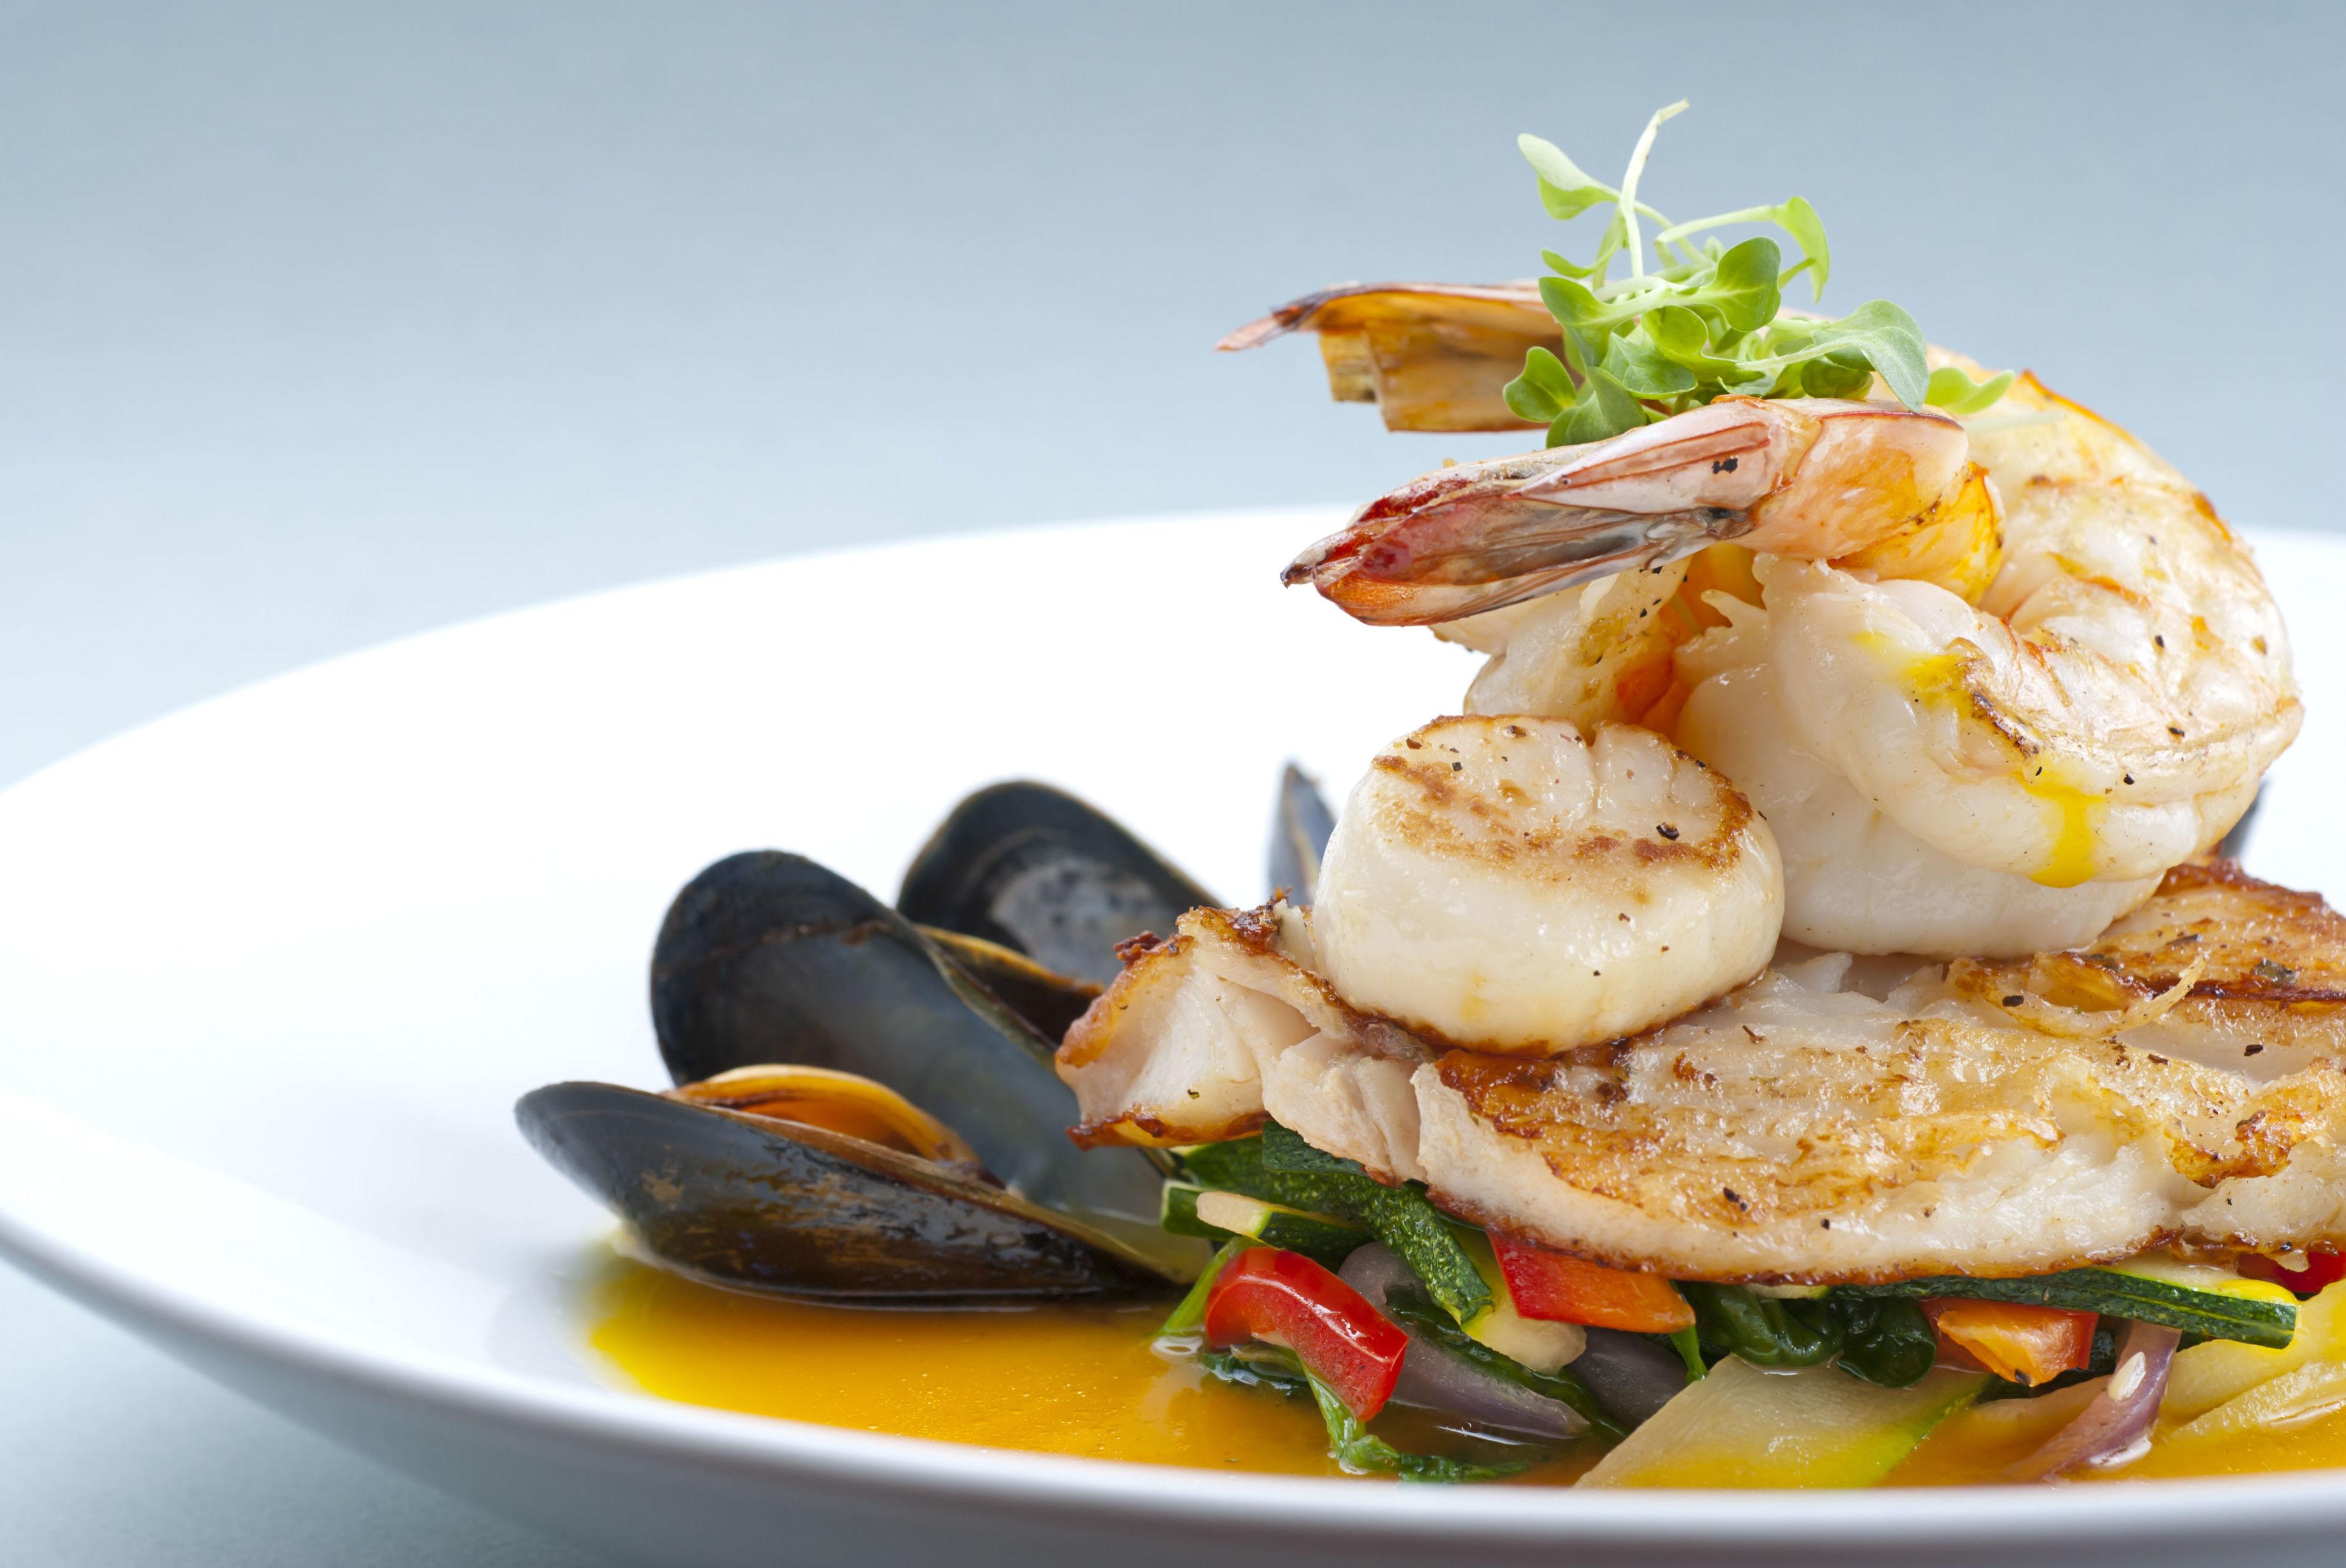 Restaurante para comer bien en Cambre, A Coruña